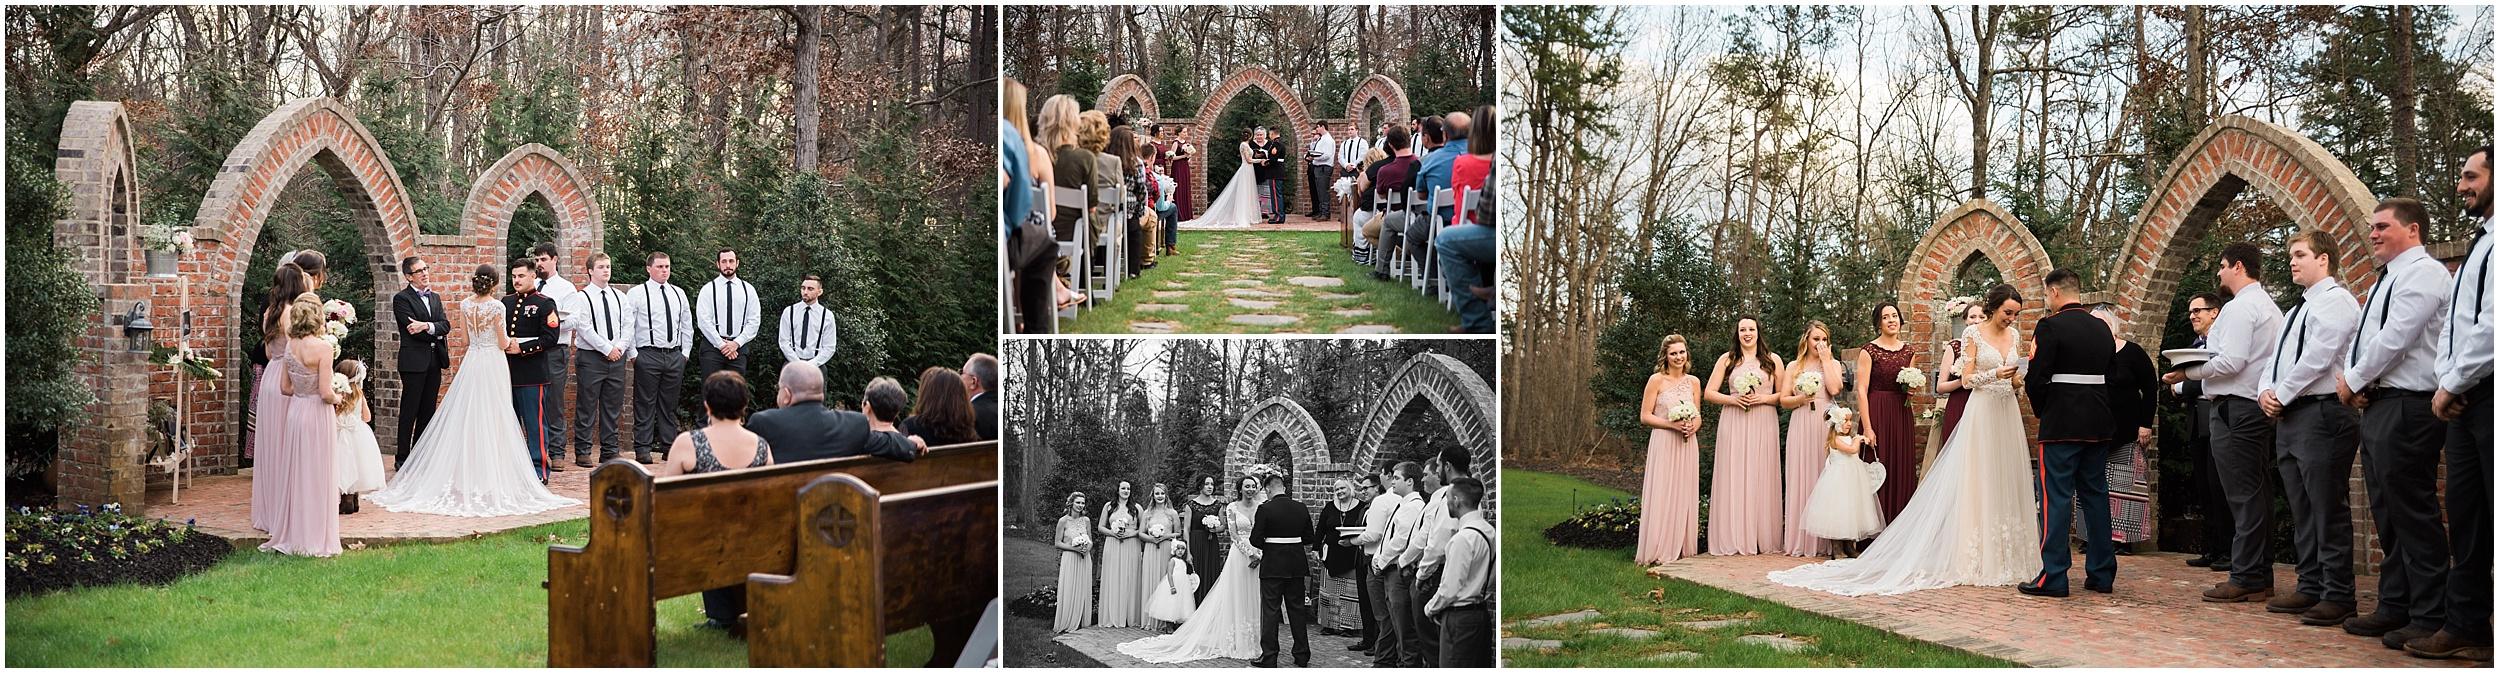 Ariel & Josh Southern Wedding in Monroe, North Carolina_0060.jpg